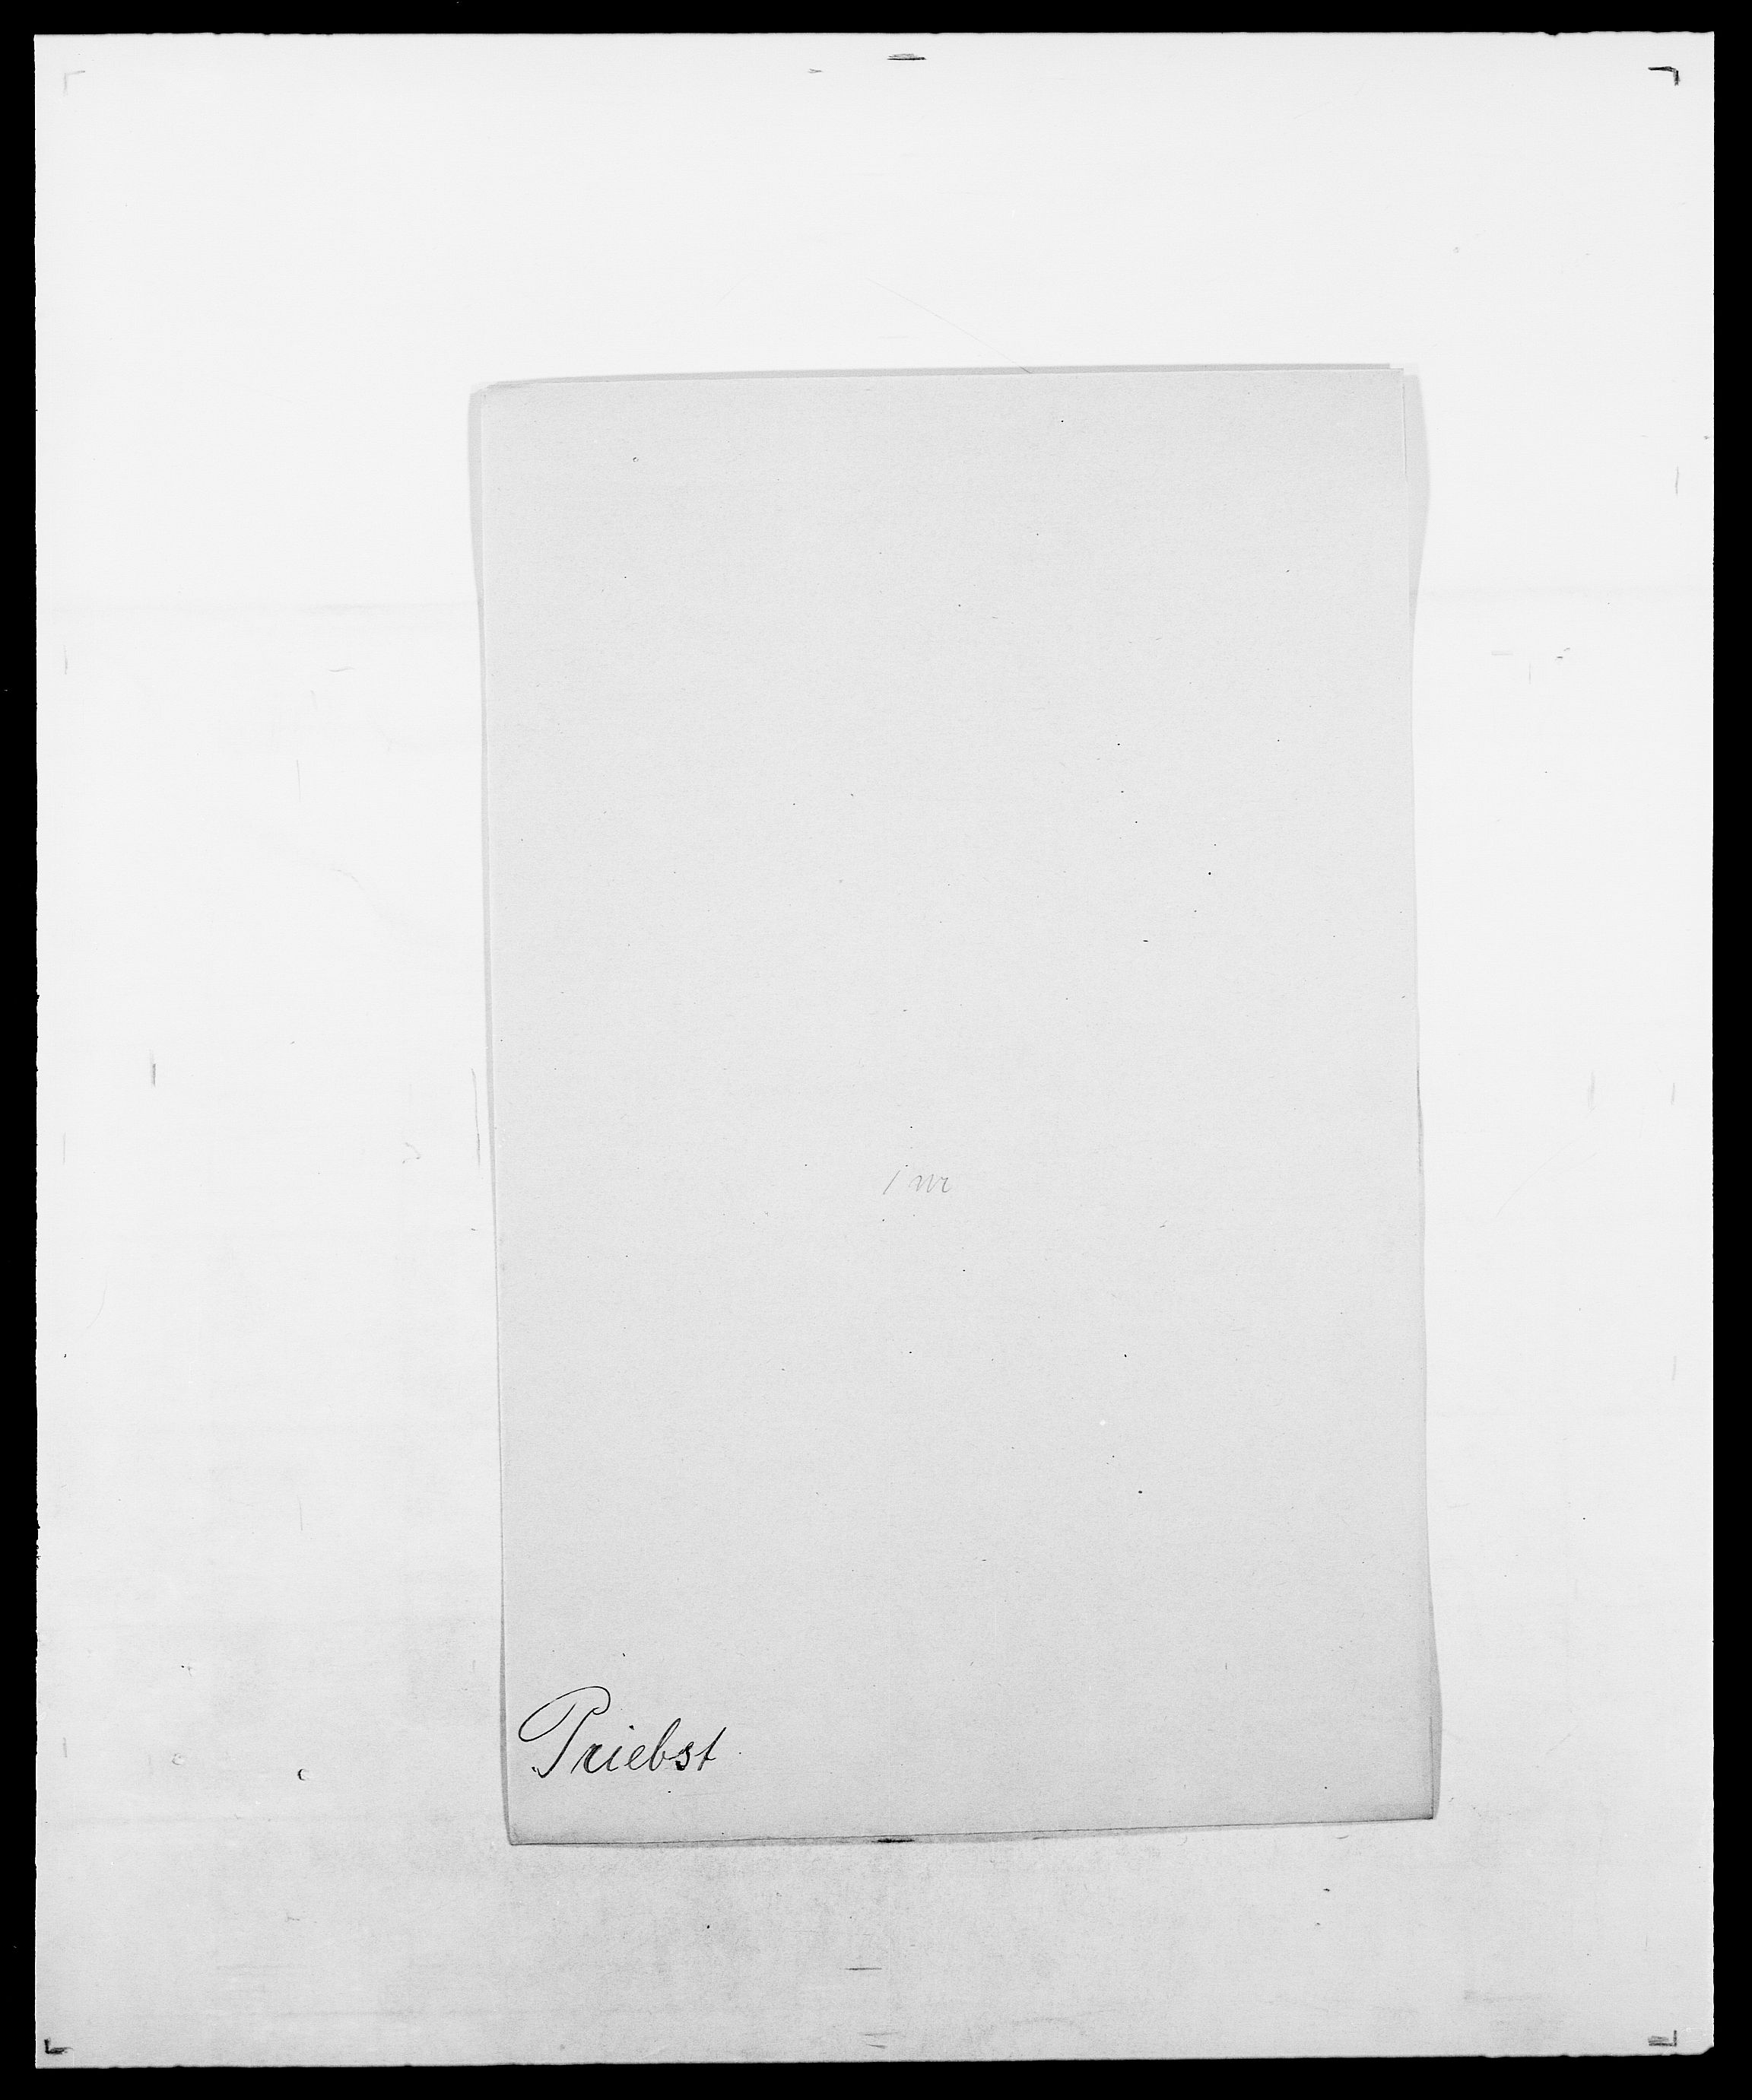 SAO, Delgobe, Charles Antoine - samling, D/Da/L0031: de Place - Raaum, s. 335